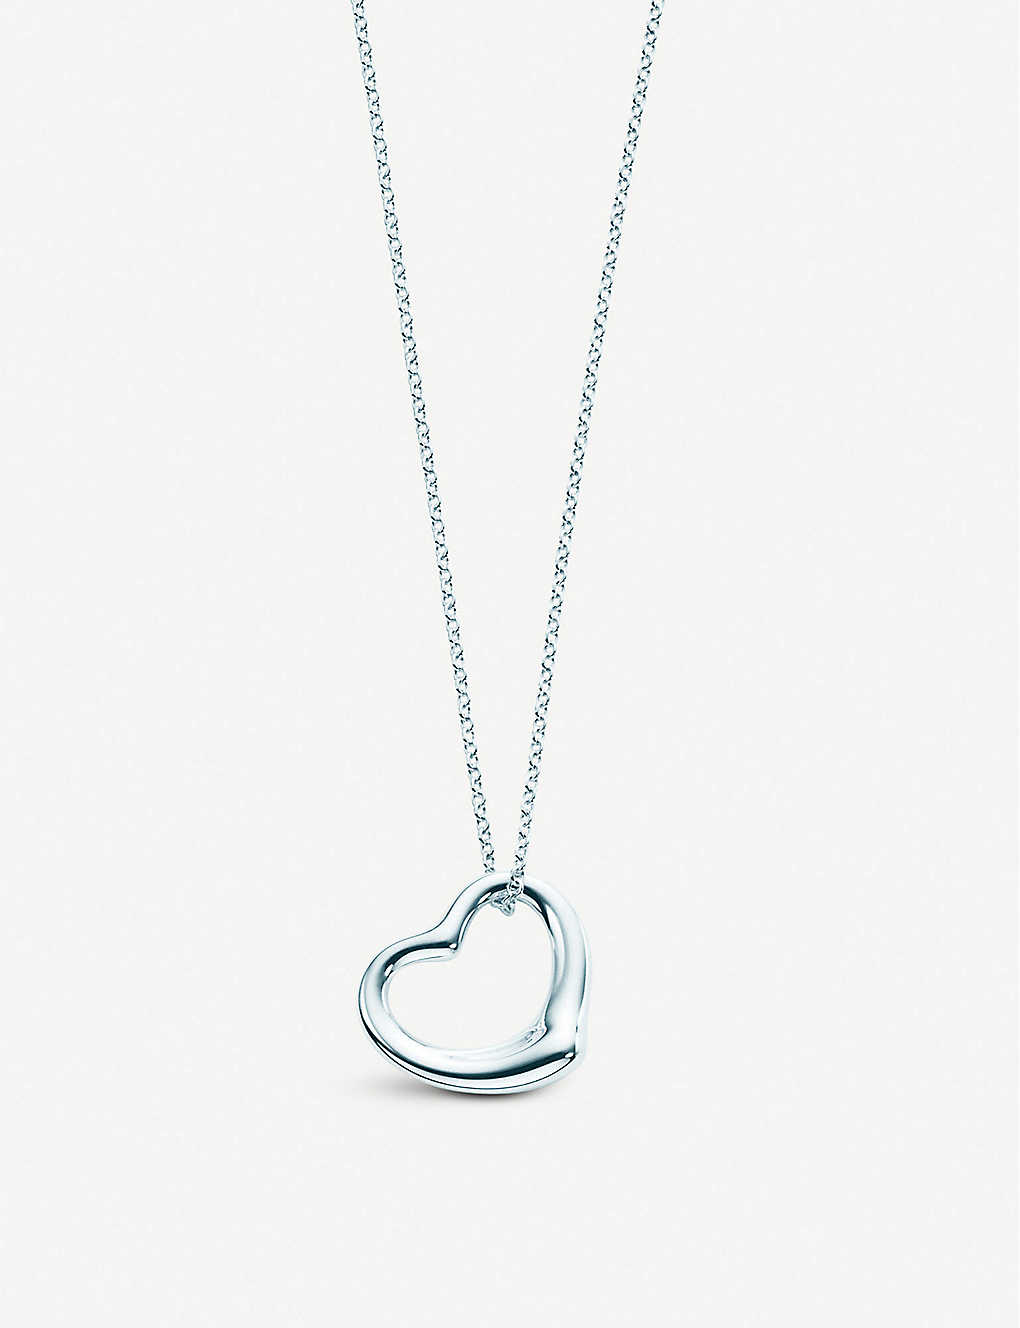 58316b7a4 TIFFANY & CO - Elsa Peretti® Open Heart pendant in sterling silver ...